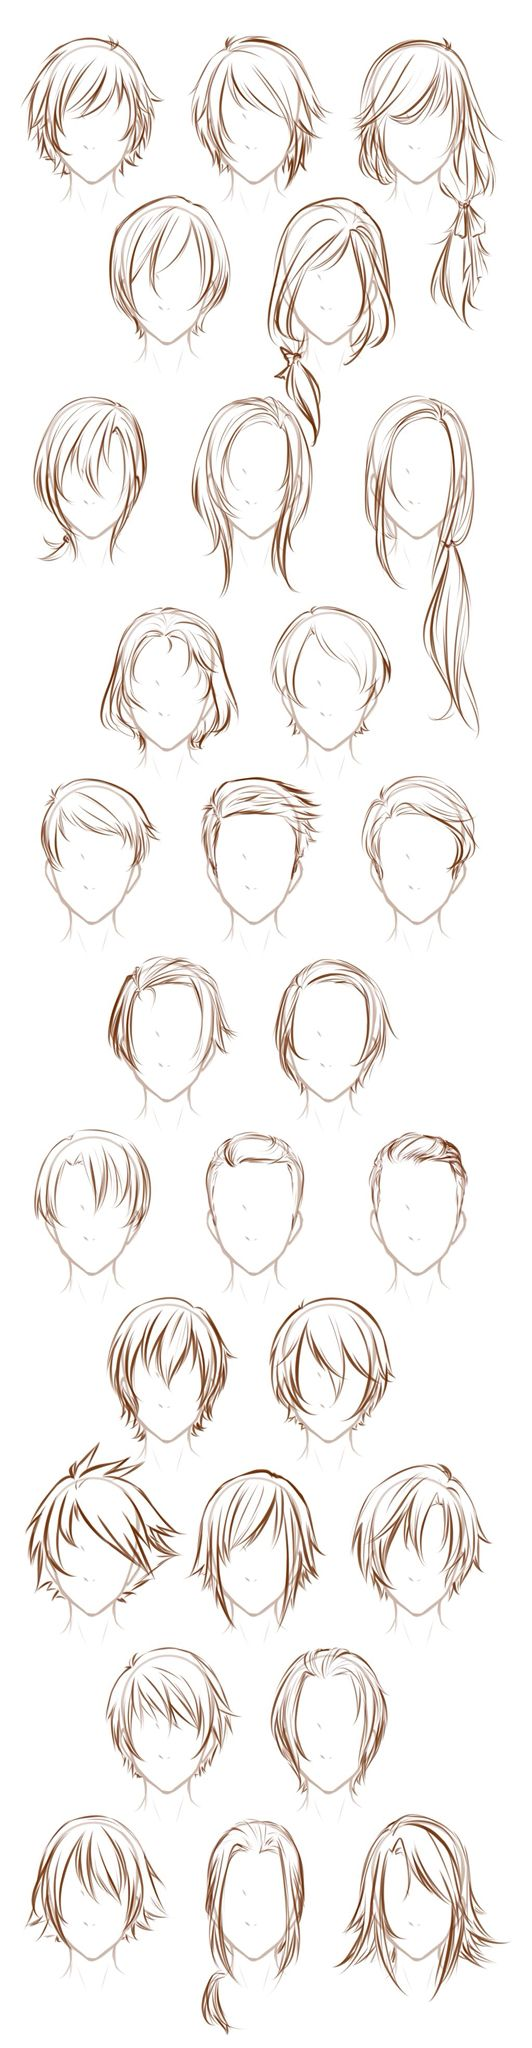 Referencia cabello masculino y femenino | Art | Pinterest | Drawings ...